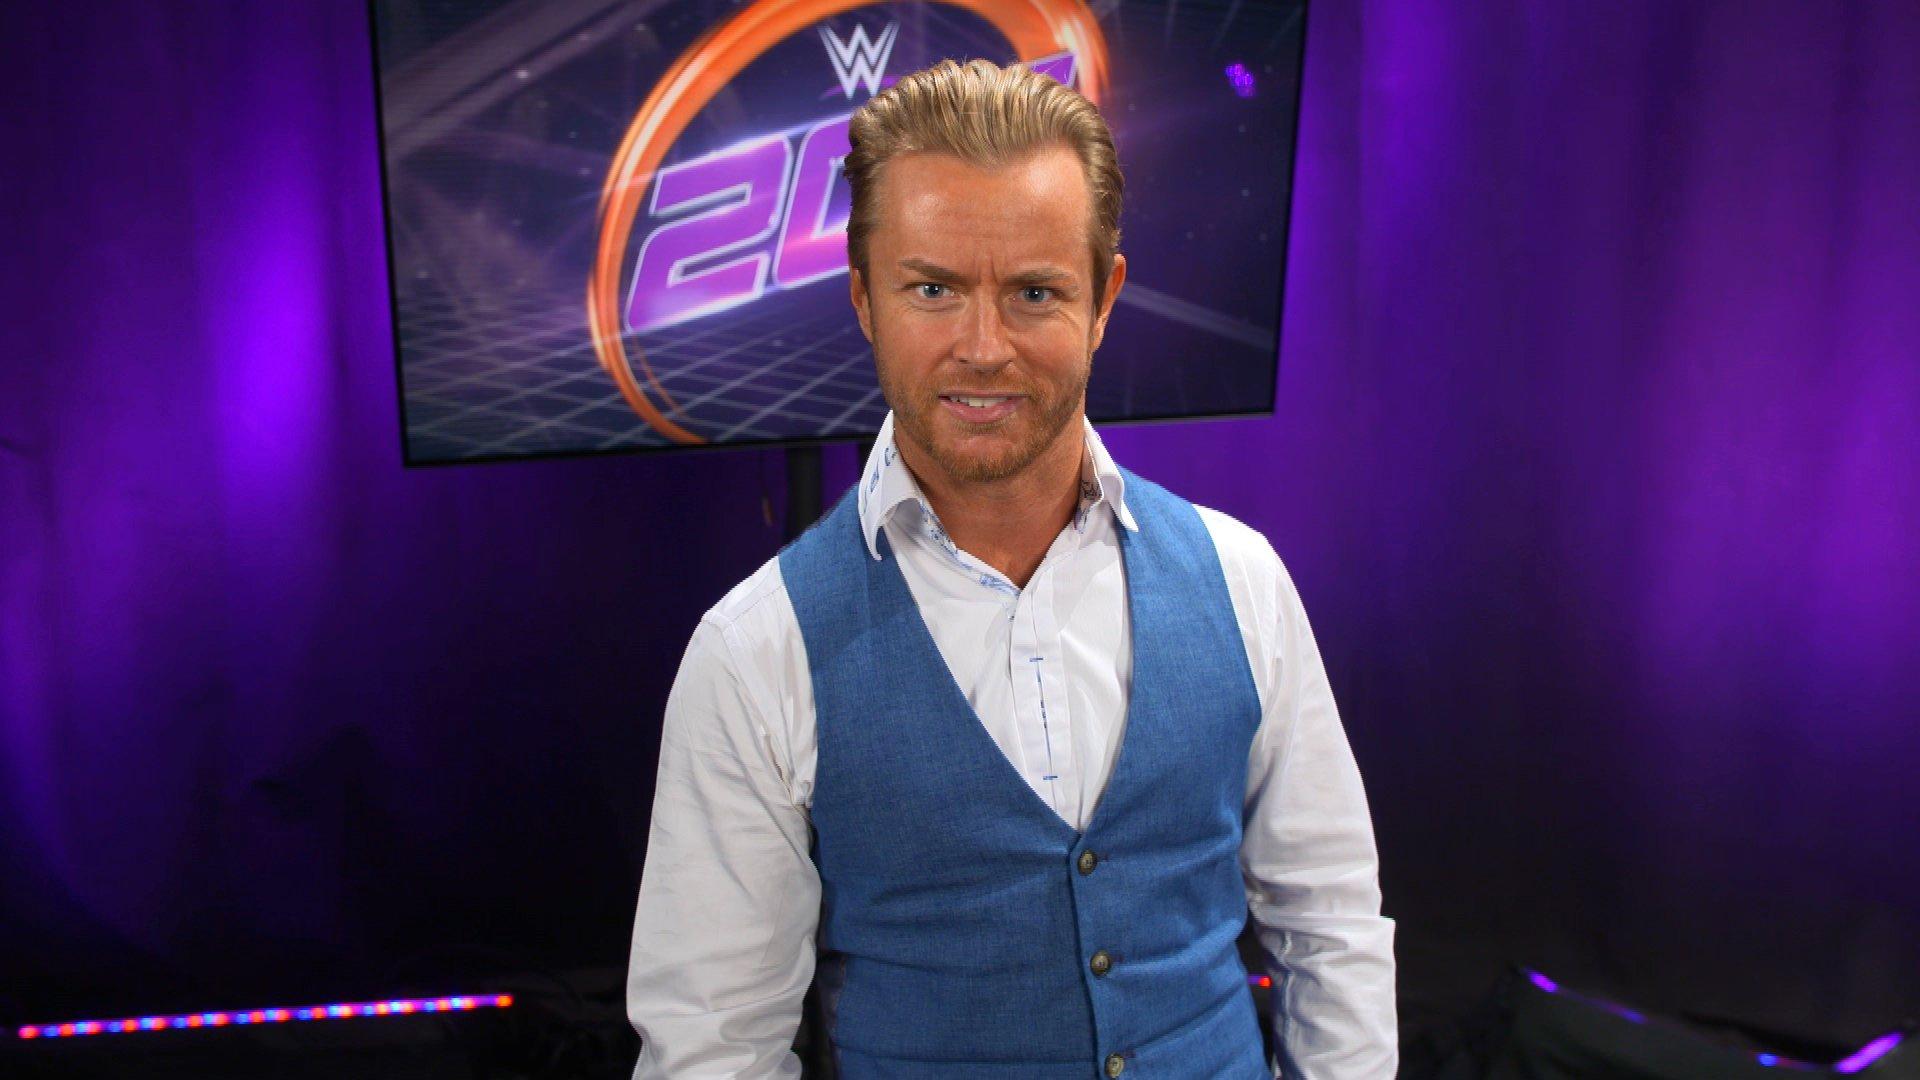 Drake Maverick annonce qu'Humberto Carrillo rejoint WWE 205 Live: Exclusivité WWE.fr, 15 Janvier 2019